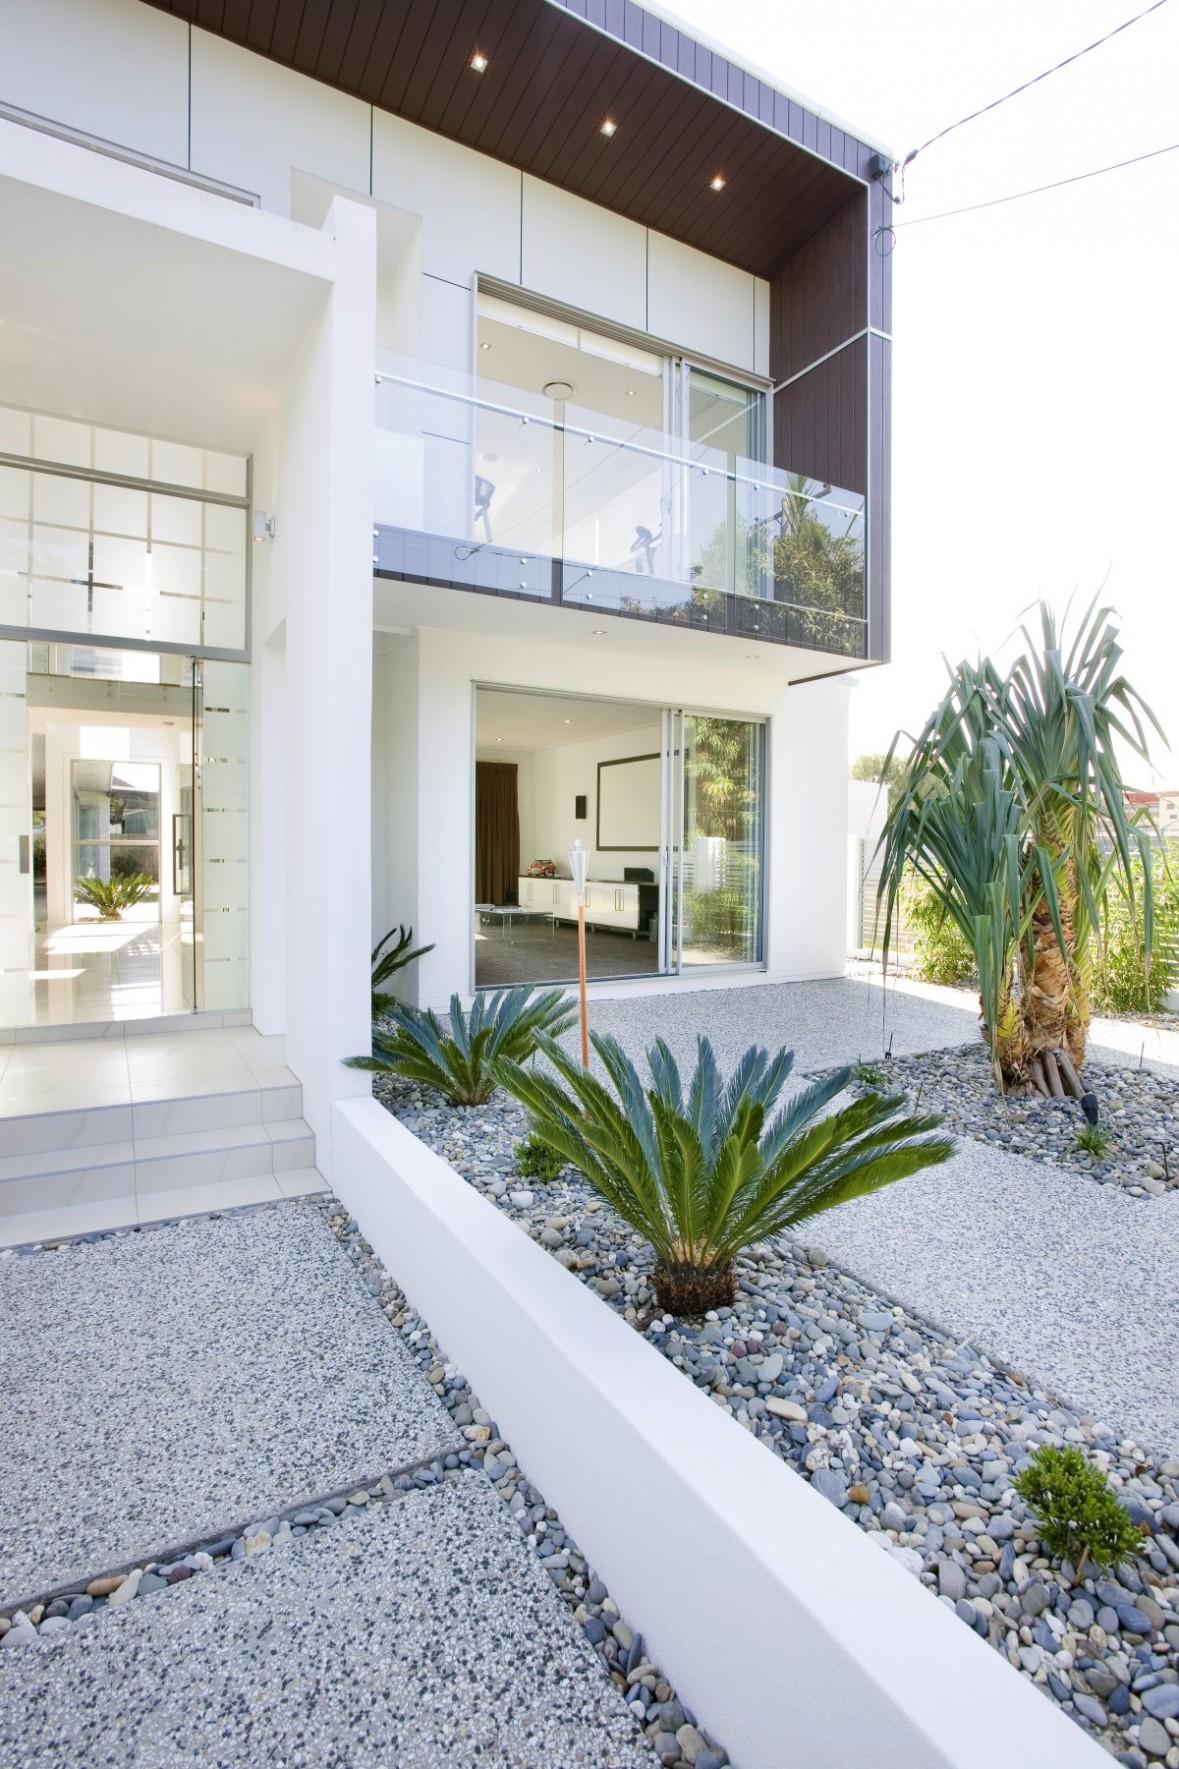 jardines modernos minimalistas con piedras